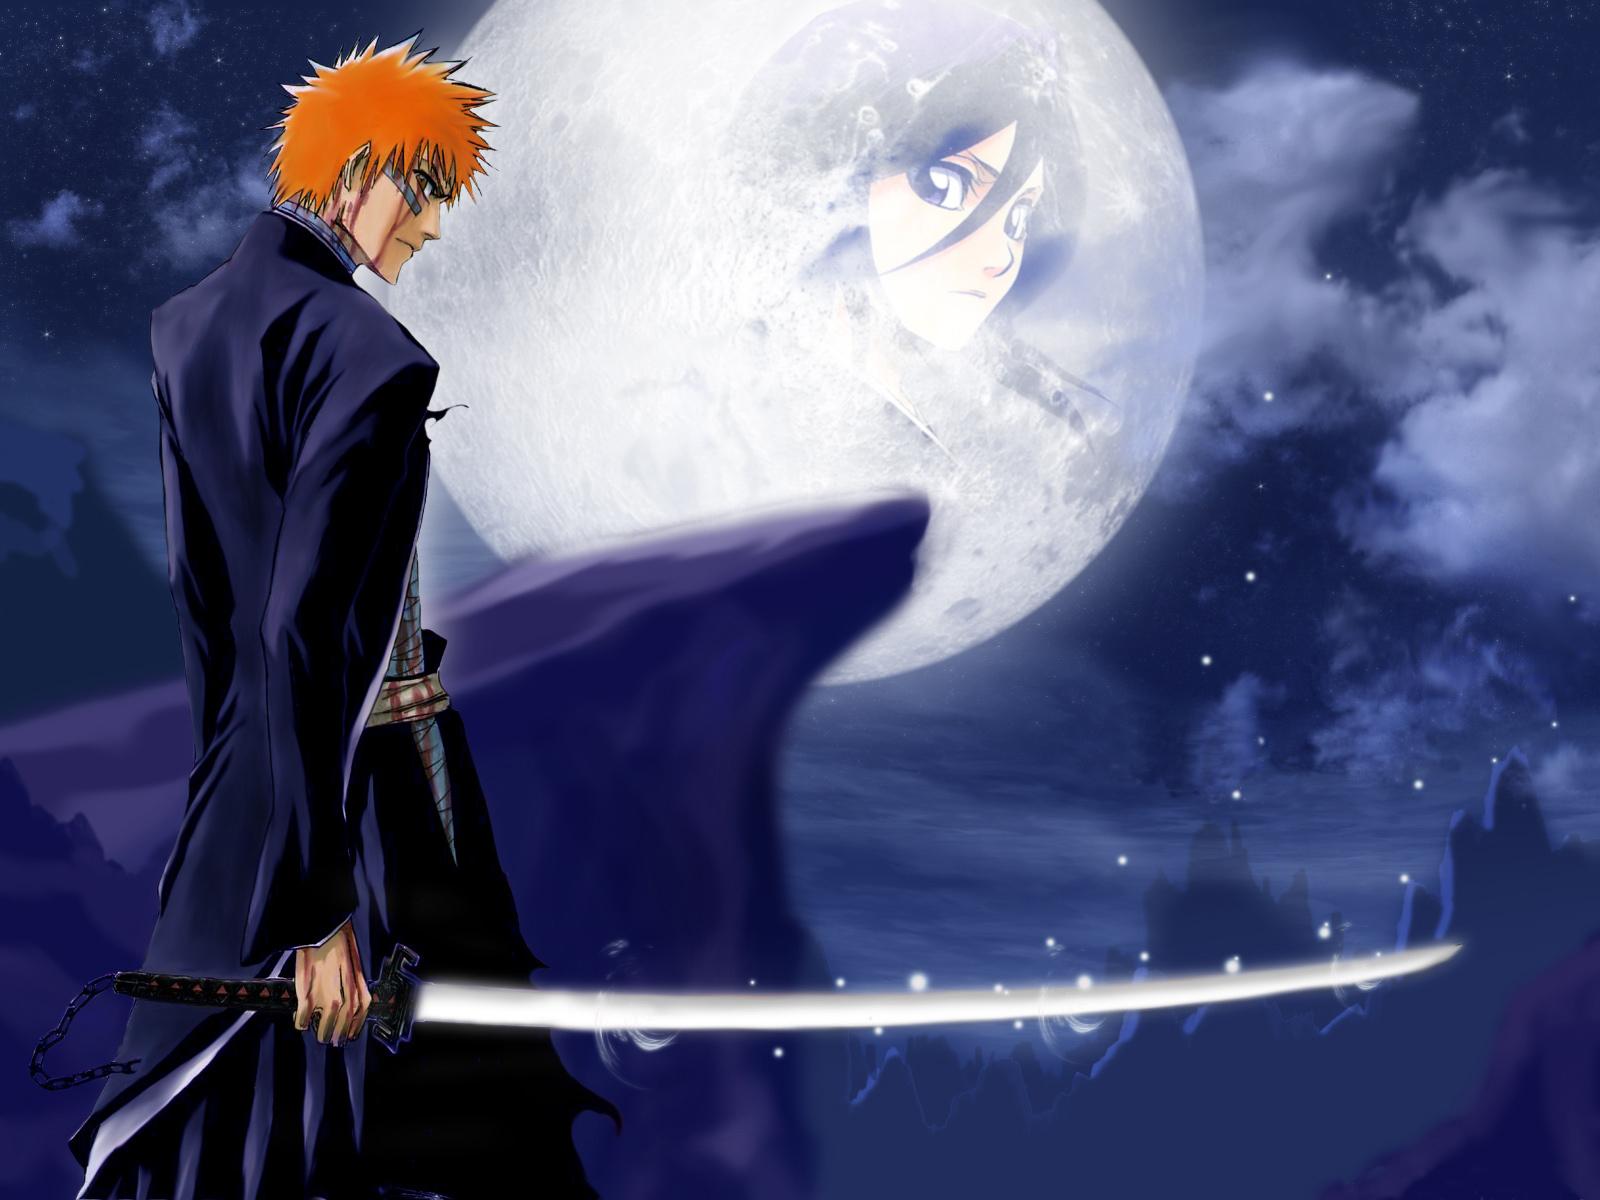 http://3.bp.blogspot.com/-x1V6MErdxpY/Tq_FzzTqKyI/AAAAAAAAB-g/Q6i0ciD2k8s/s1600/Bleach-Anime-HD-Wallpapers-2.jpg